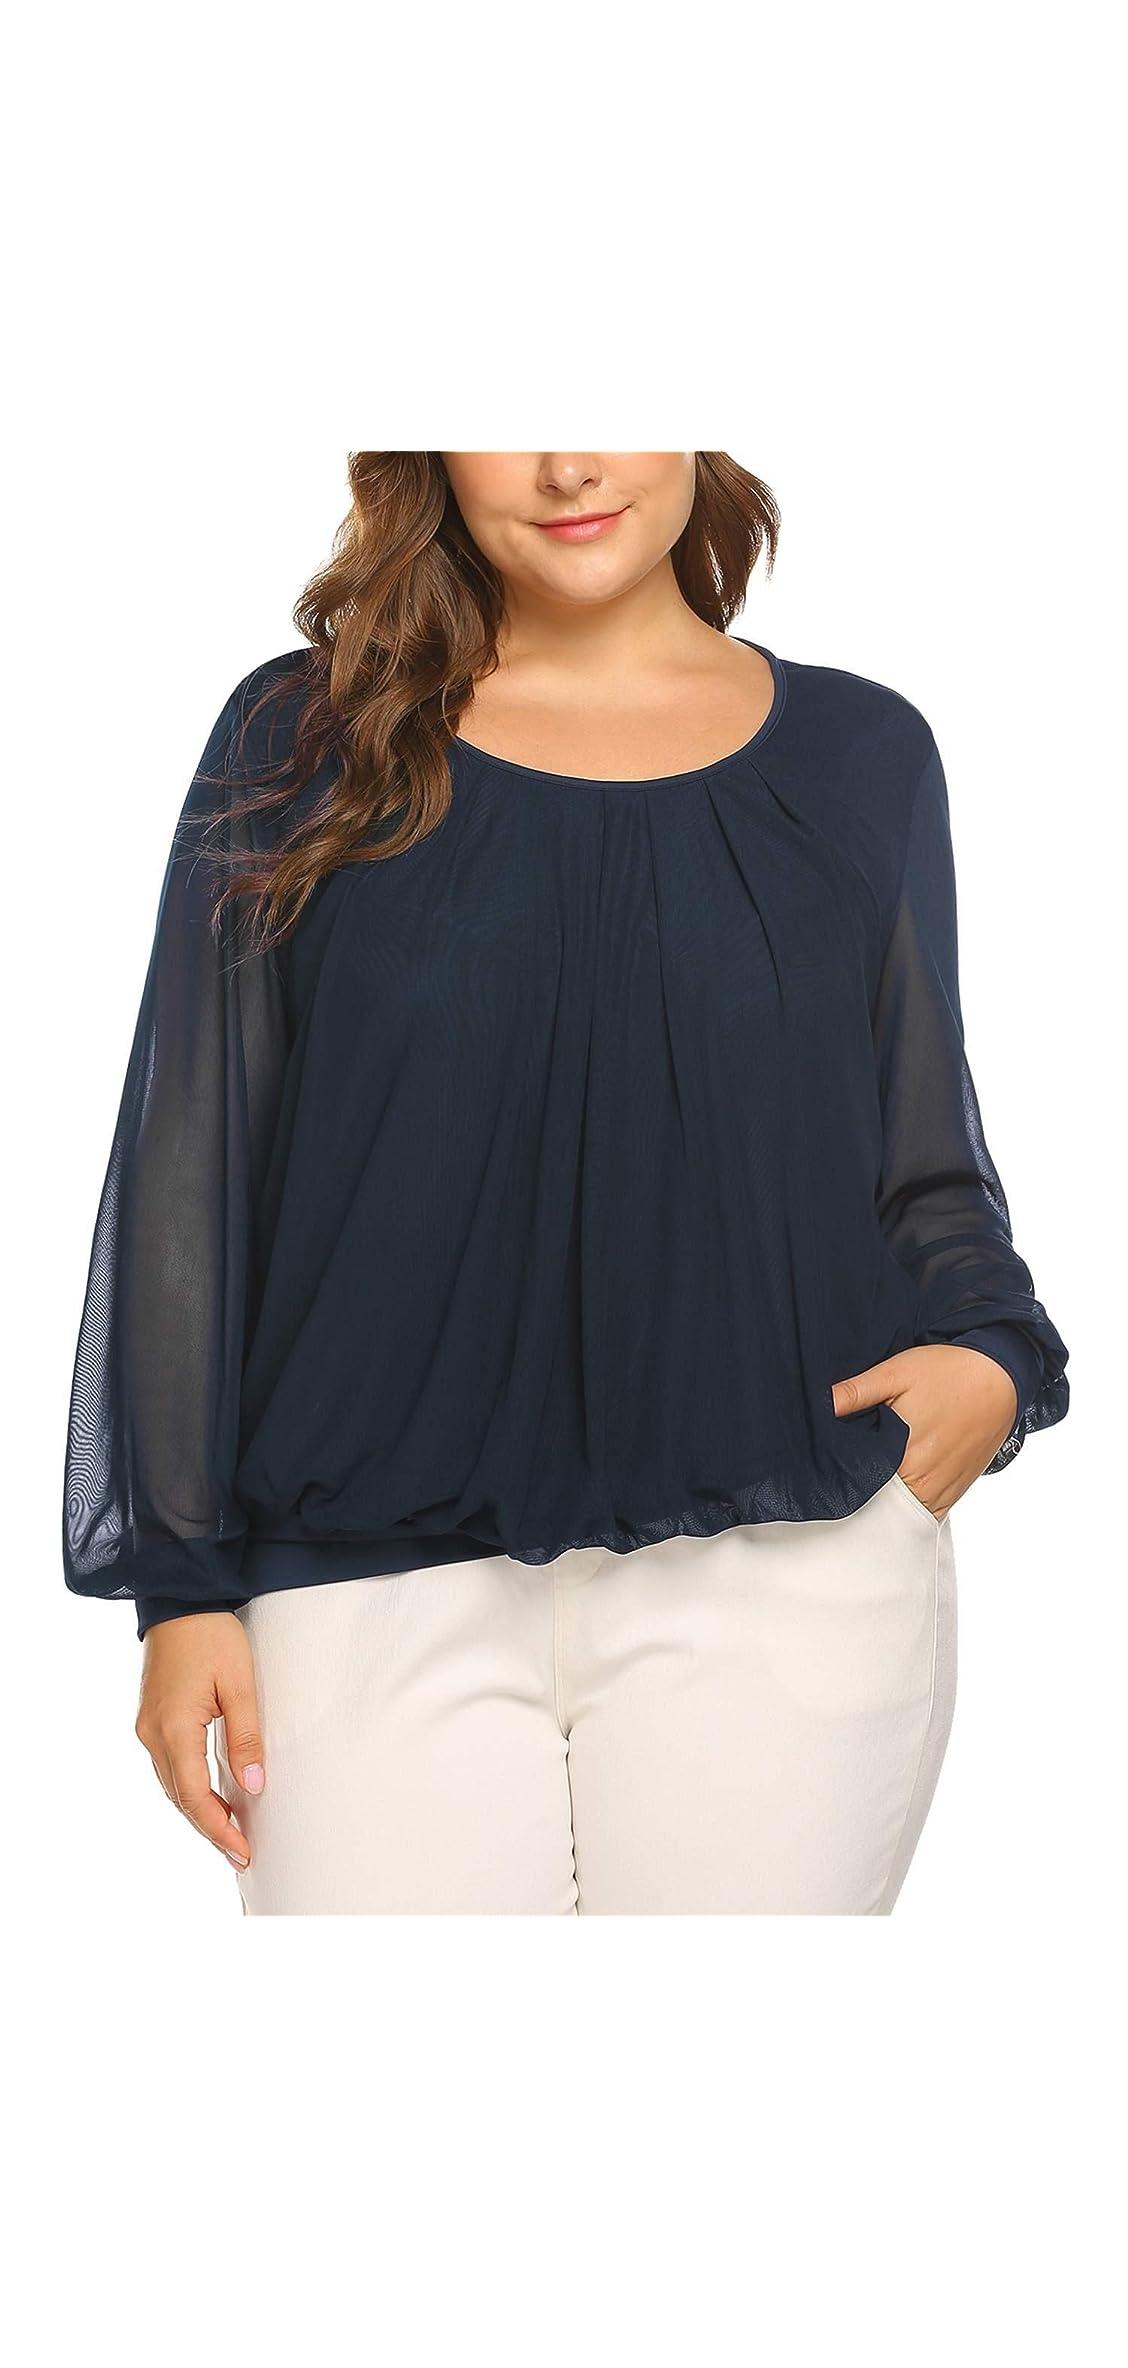 Women's Plus Size Blouses Short/long Sleeve Tunic Tops